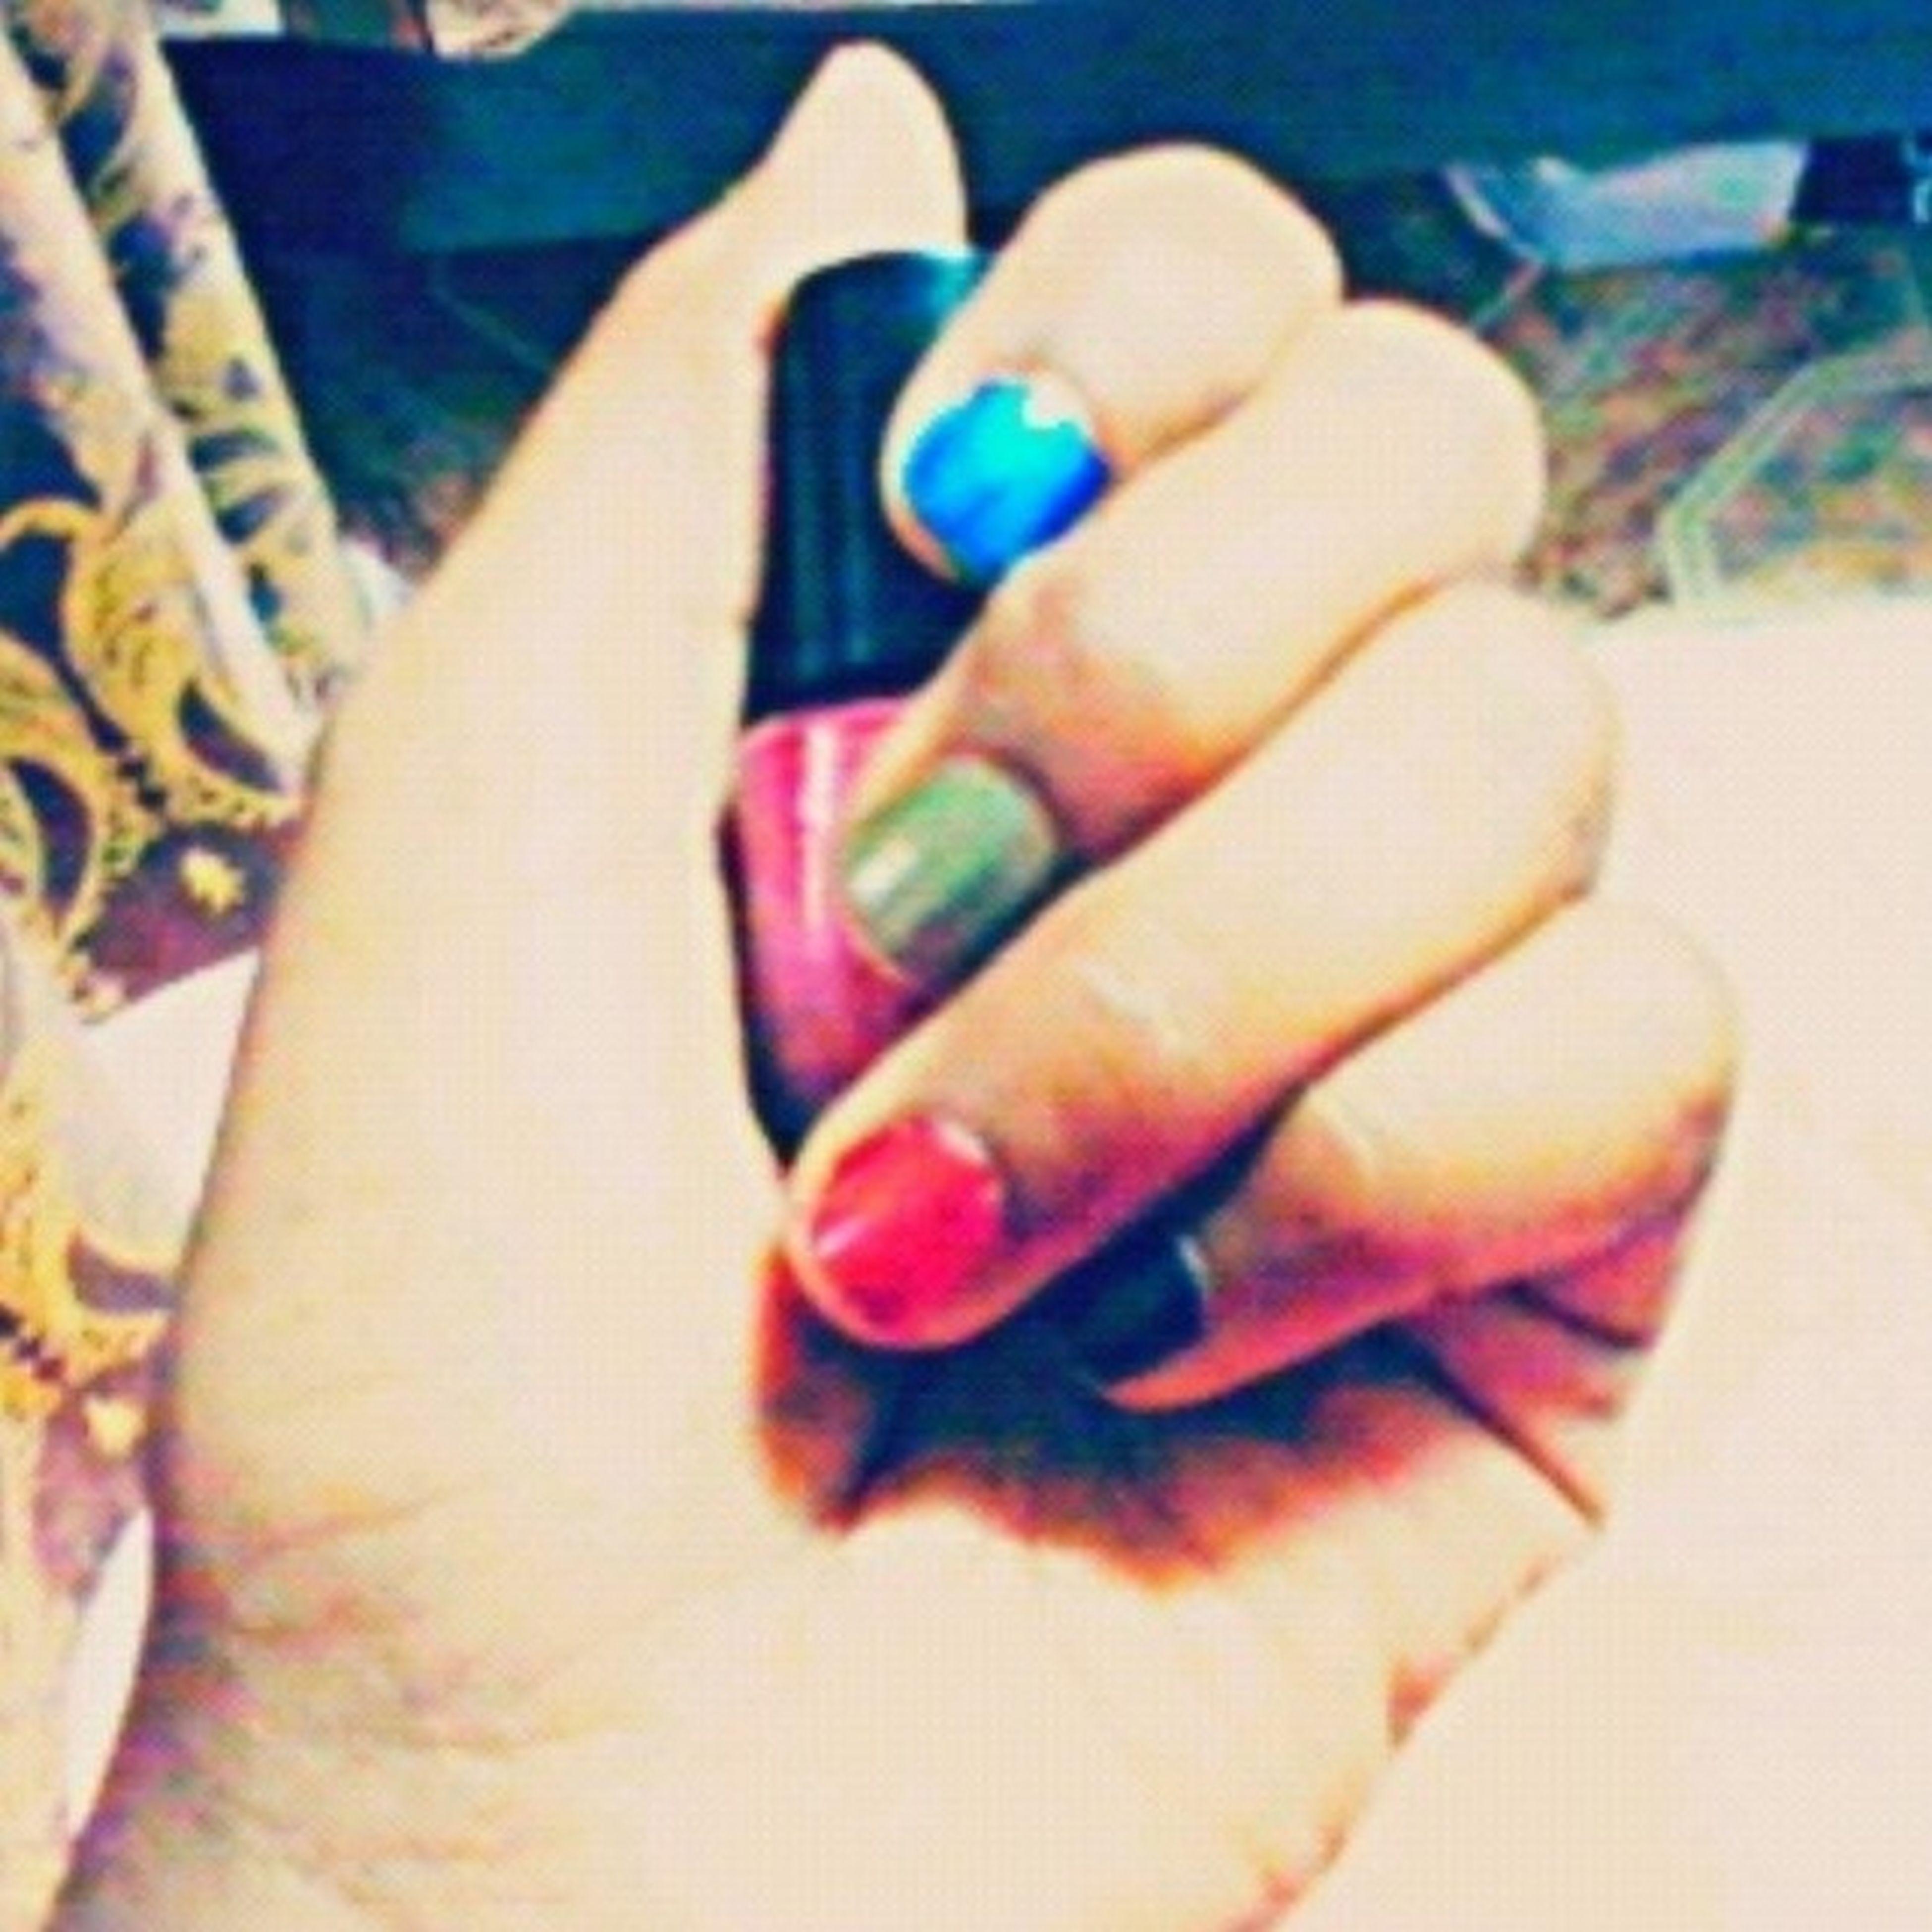 Me doing nail polishing to waste Time Nailpolishing Boring Wastingtime